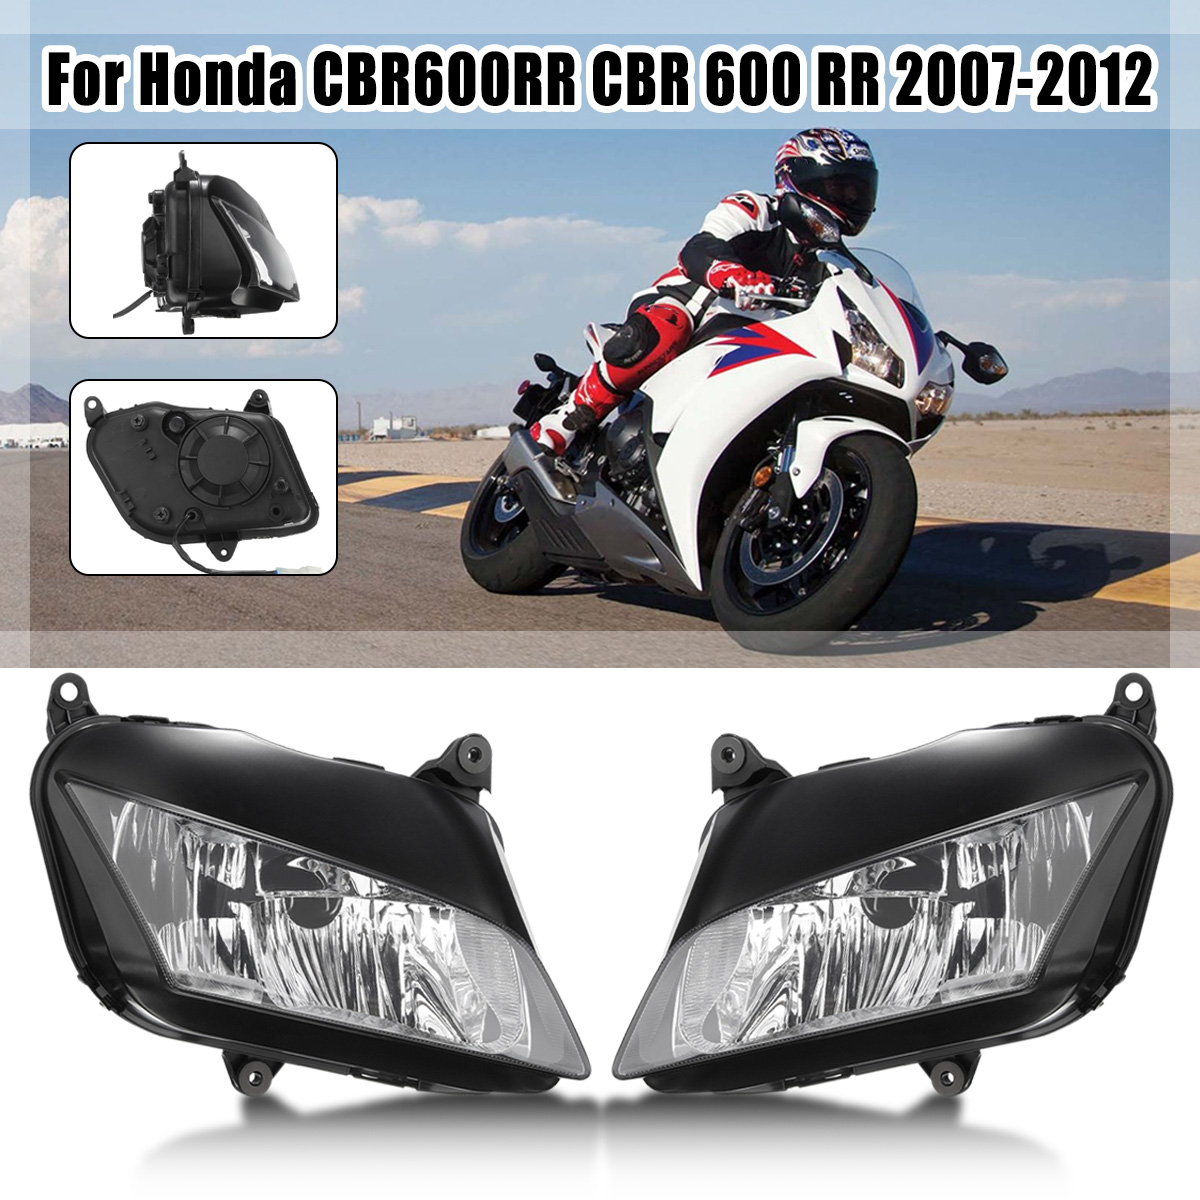 for Honda Cbr 600Rr Motorcycle Headlight Head Lamp For Honda Cbr600Rr 07 2008 2009 2010 11 2007 - 2011 Cbr600 600 Rr Stylingfor Honda Cbr 600Rr Motorcycle Headlight Head Lamp For Honda Cbr600Rr 07 2008 2009 2010 11 2007 - 2011 Cbr600 600 Rr Styling